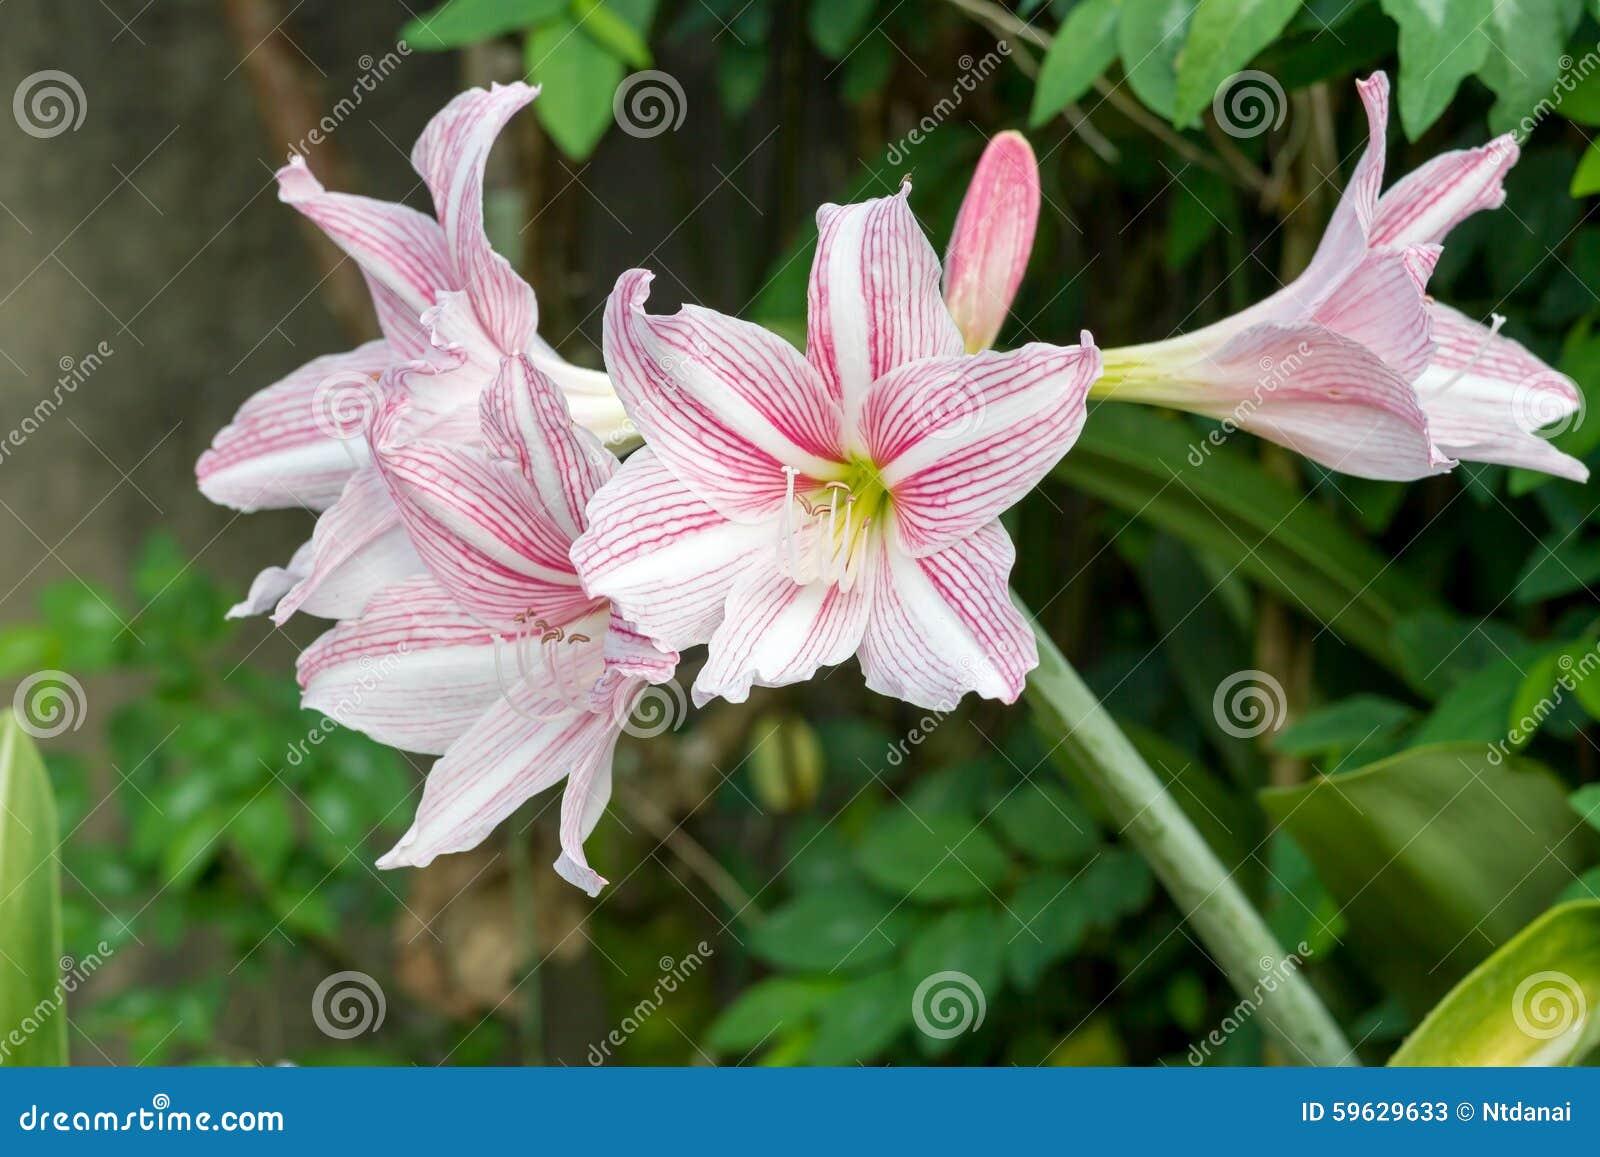 Pink White Amaryllis Flowers Stock Image Image Of Green Plant